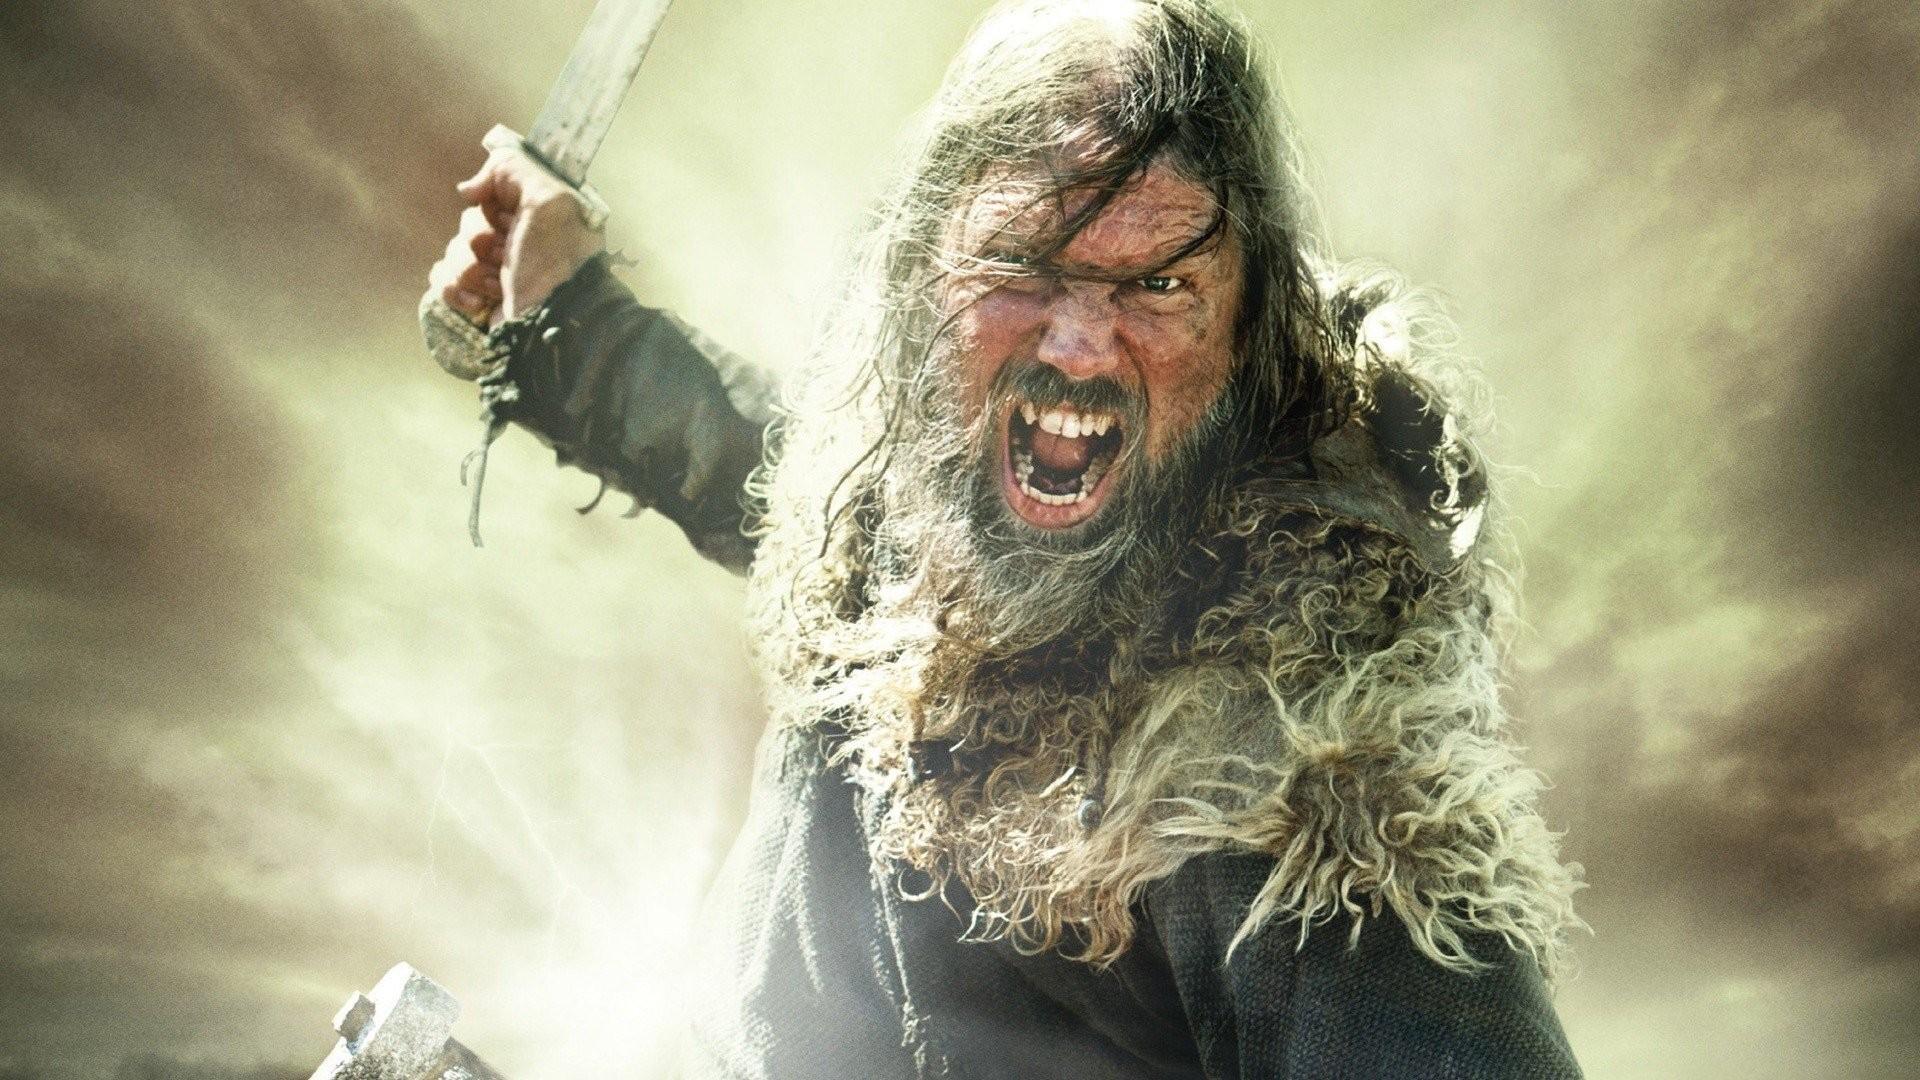 NORTHMEN VIKING SAGA fantasy action adventure history fighting 1northmen warrior  wallpaper     580219   WallpaperUP